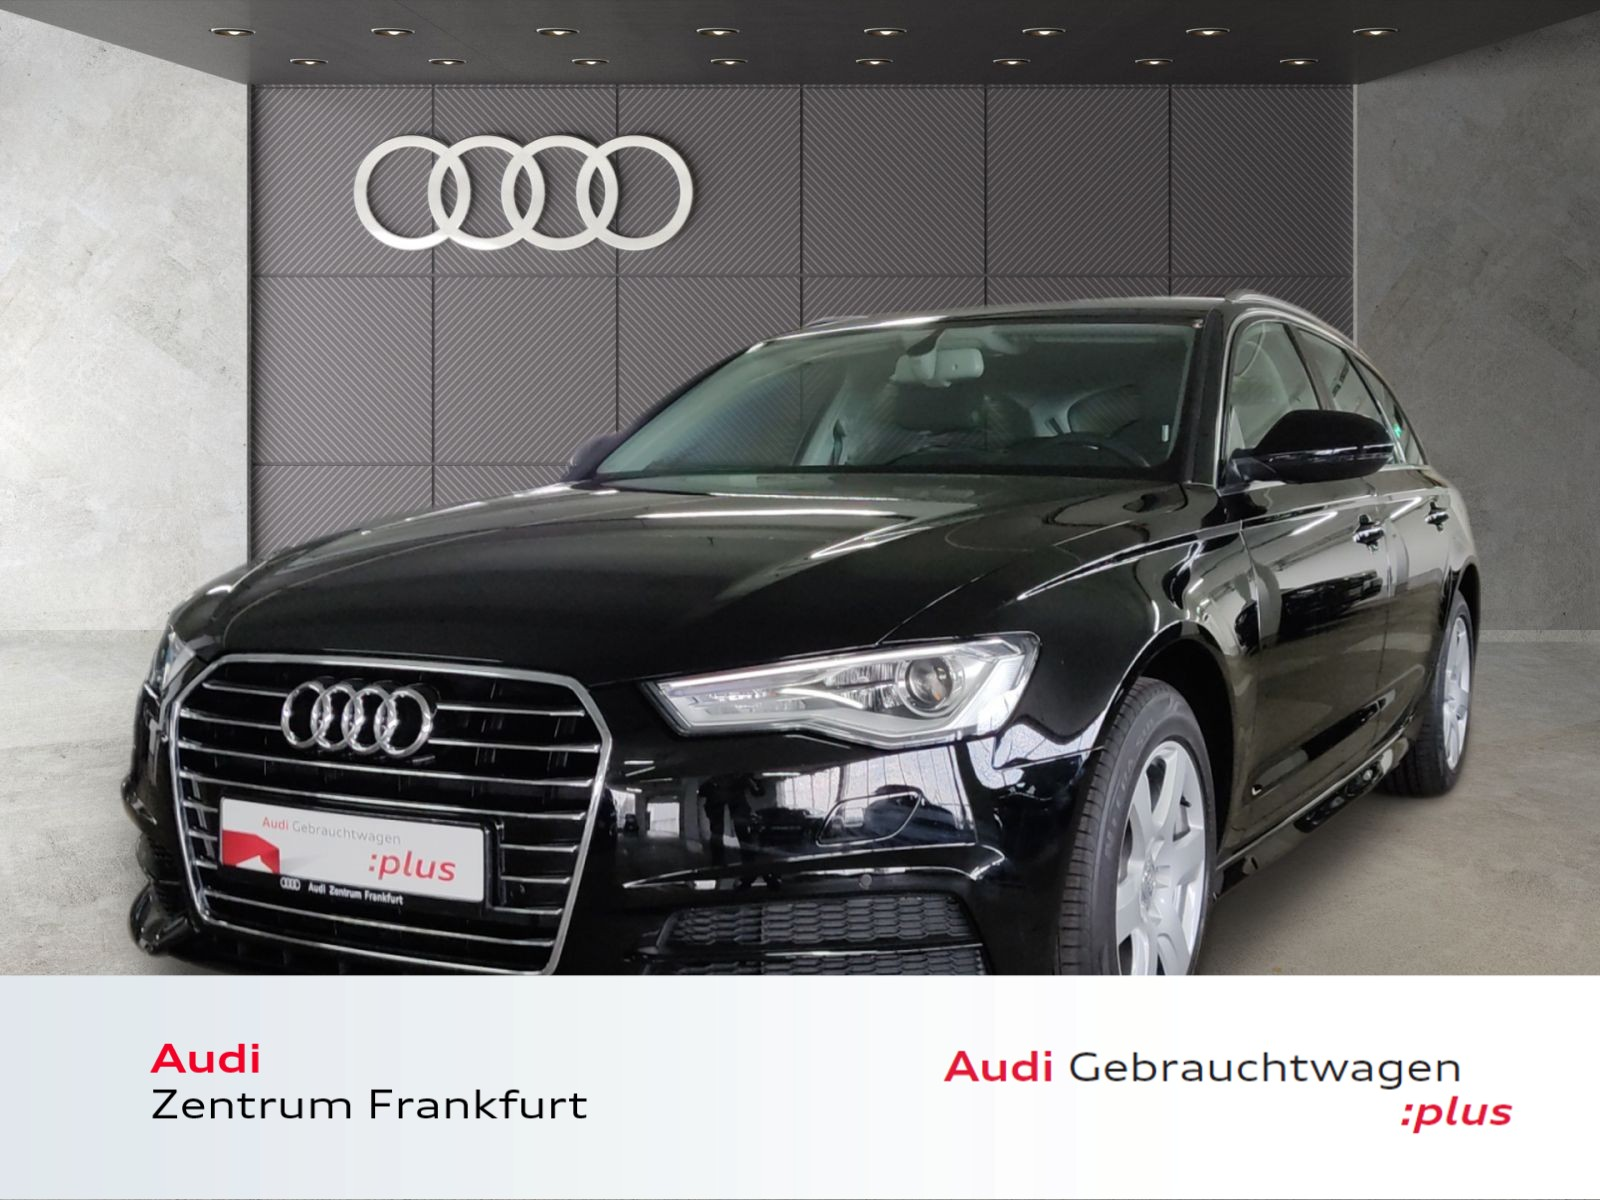 Audi A6 Avant 2.0 TDI ultra S tronic Xenon Navi PDC Tempomat Sitzheizung, Jahr 2018, Diesel